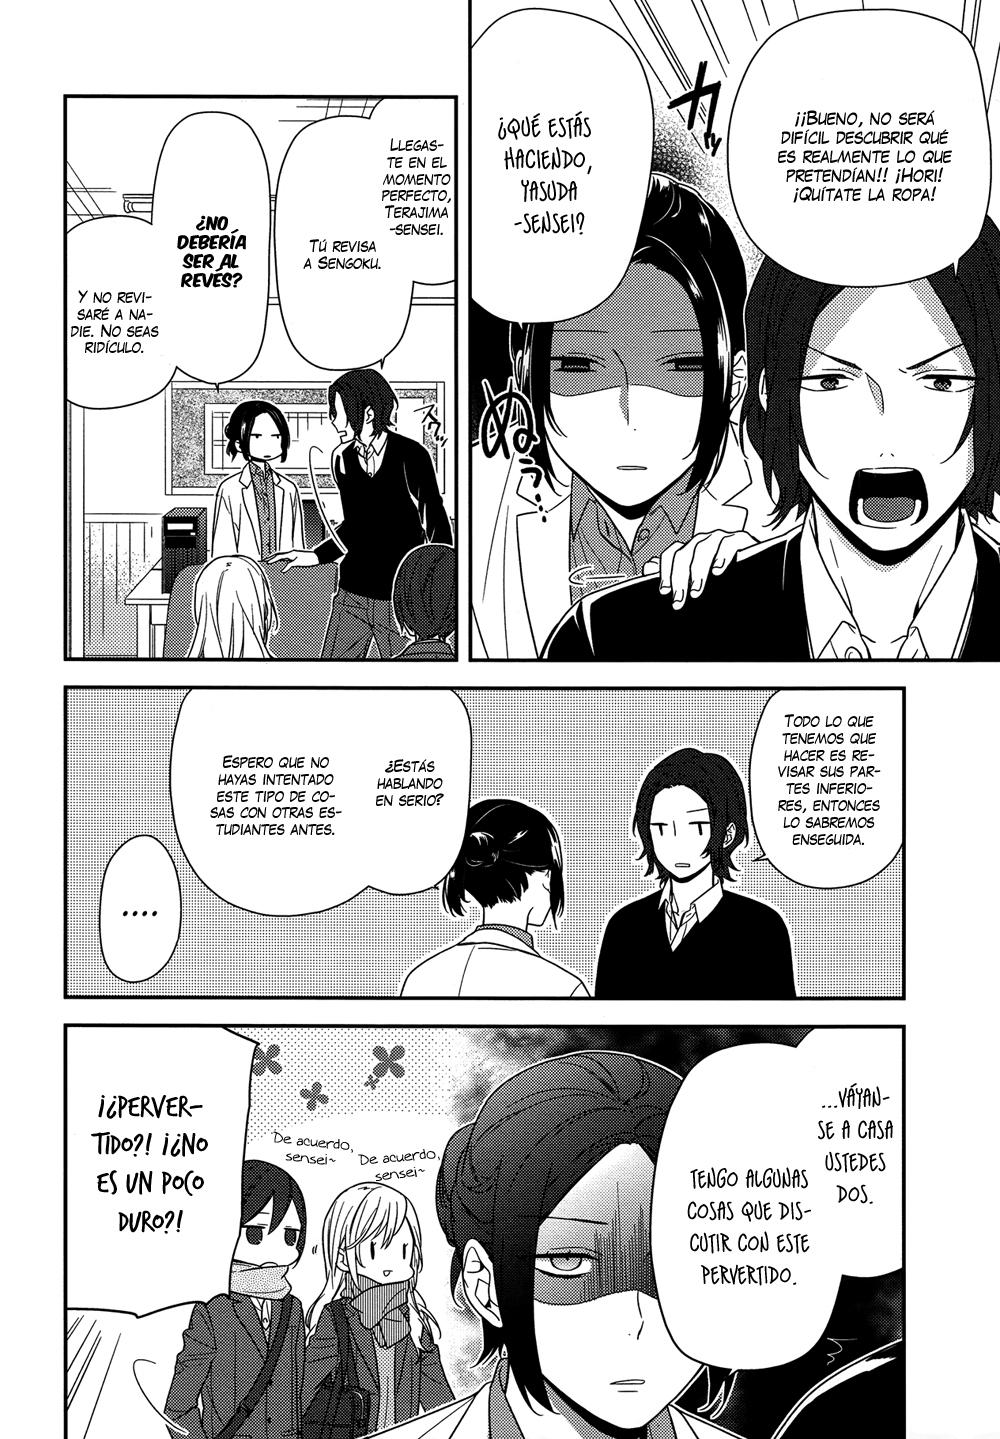 http://c5.ninemanga.com/es_manga/pic2/19/1043/499923/346401548fda241720bfad6c7f671255.jpg Page 9